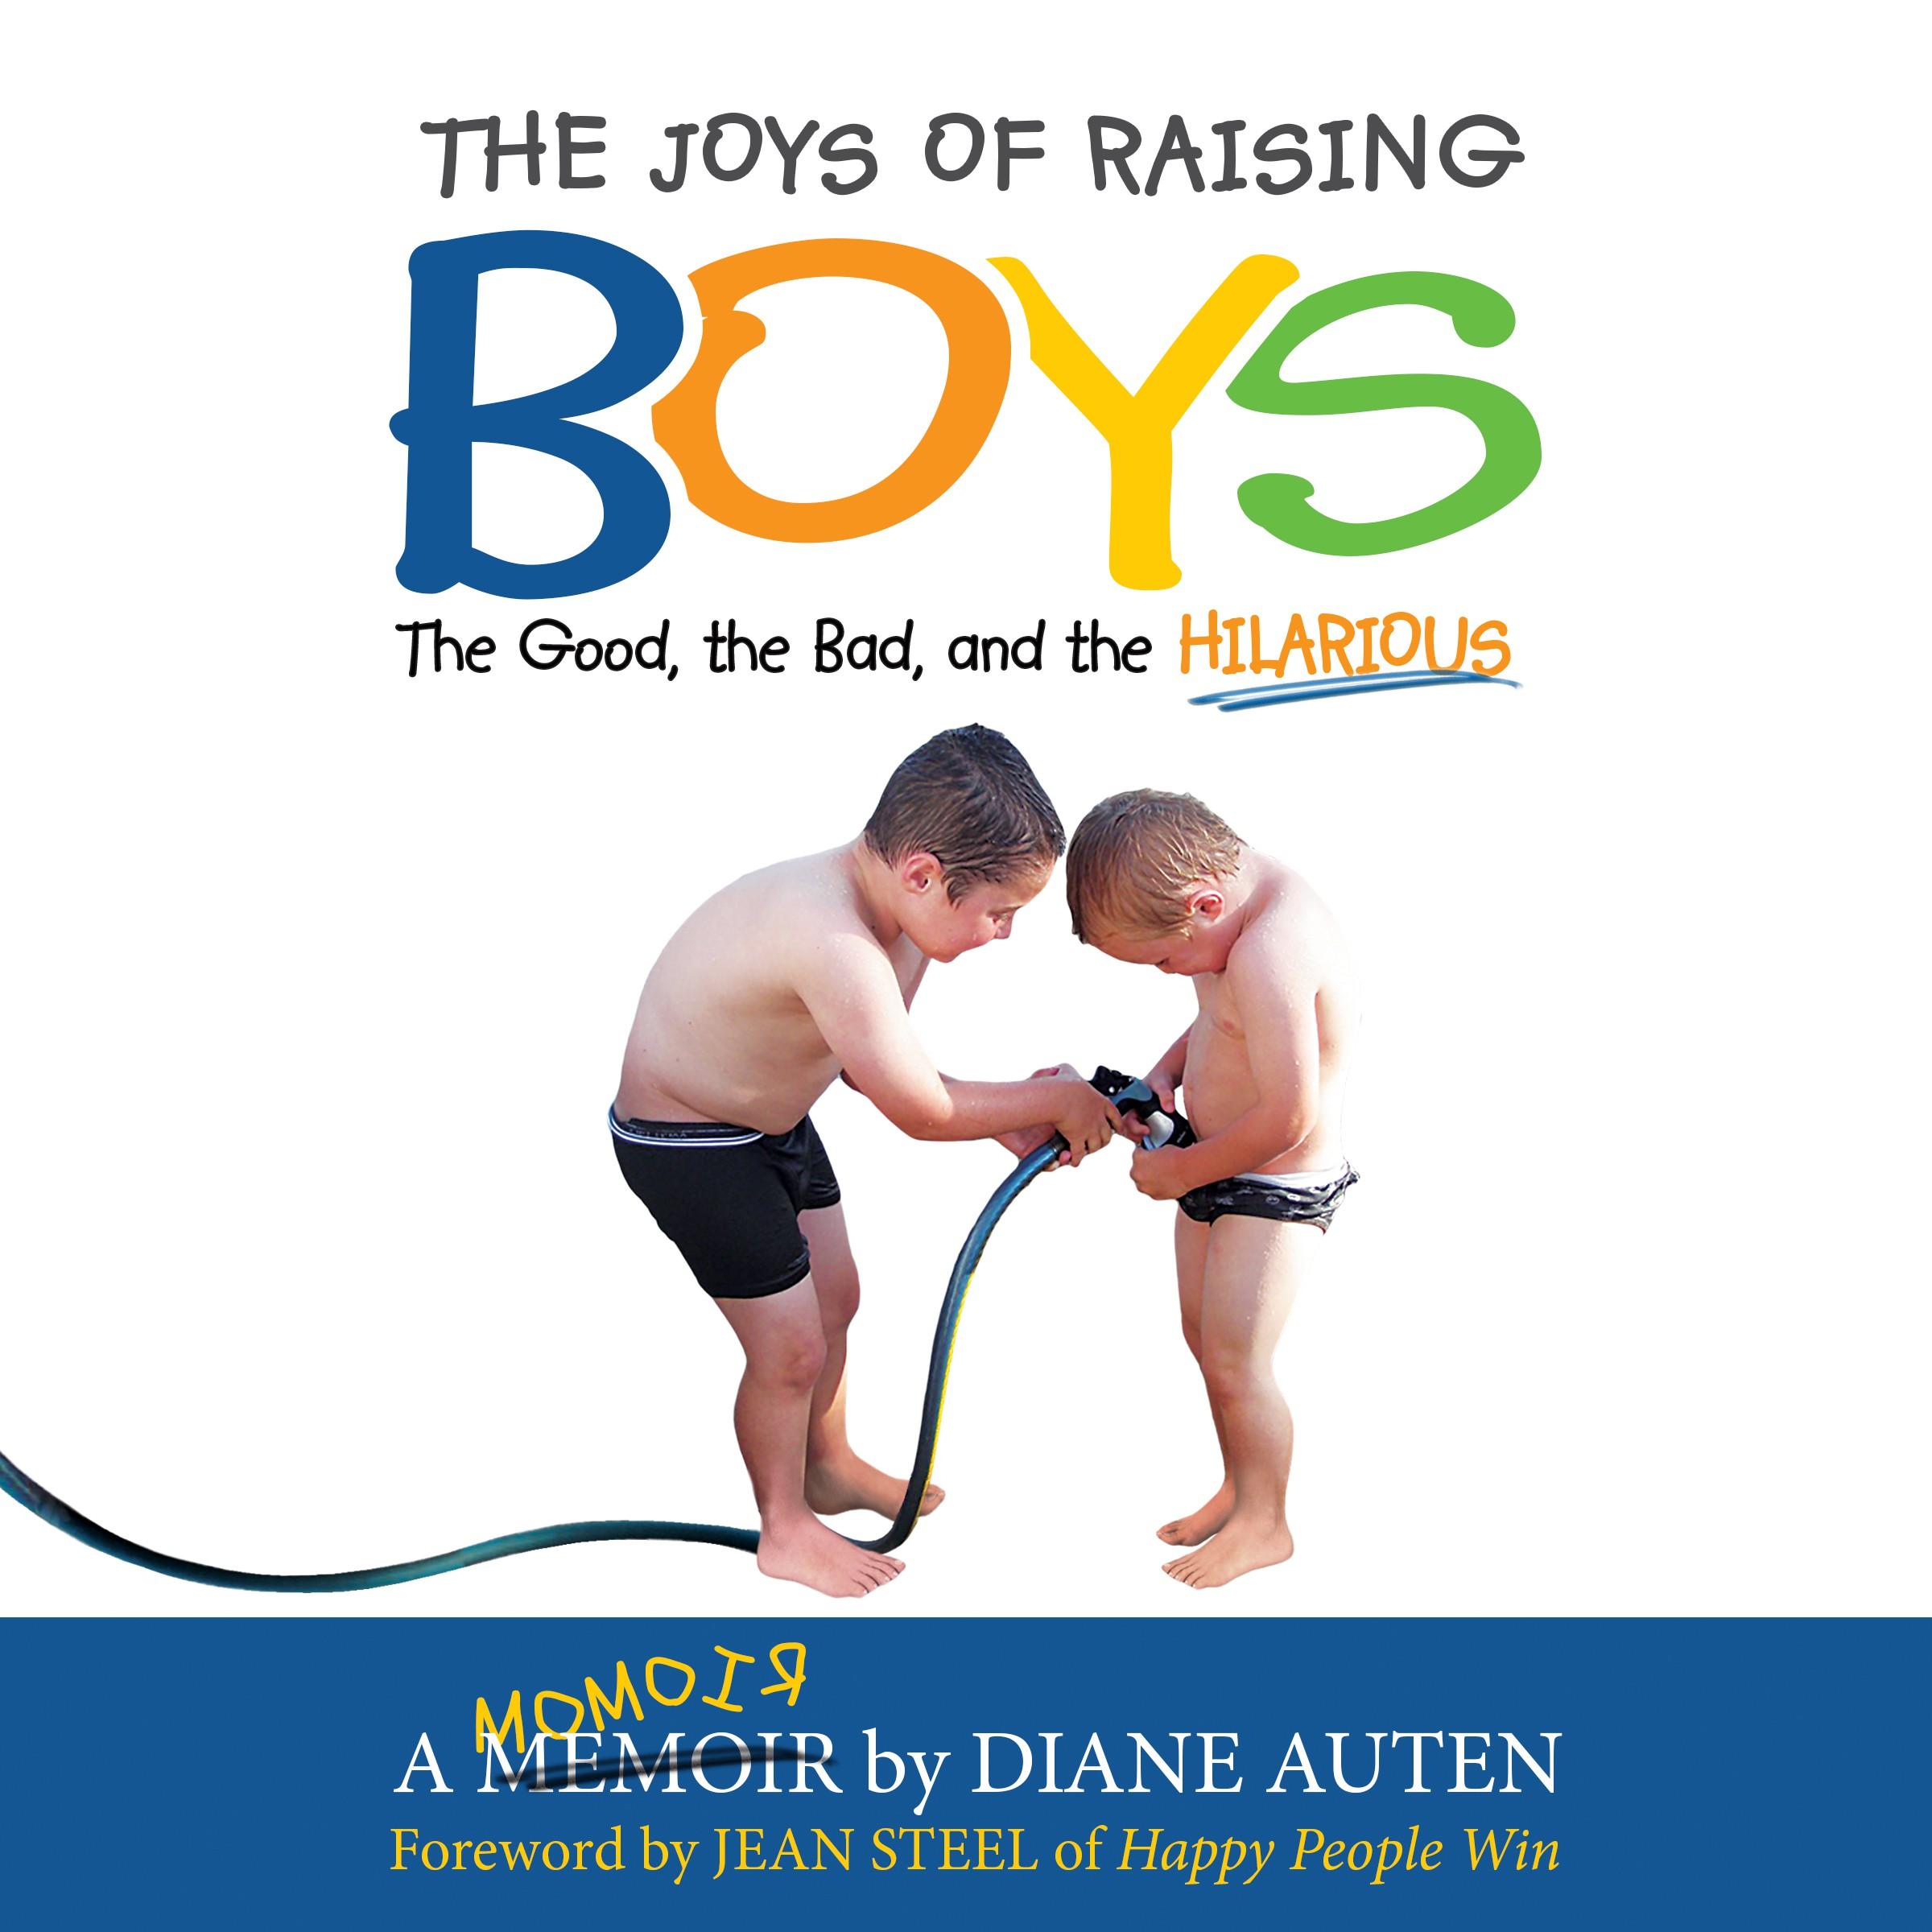 Funny Nonfiction Book about Raising Boys